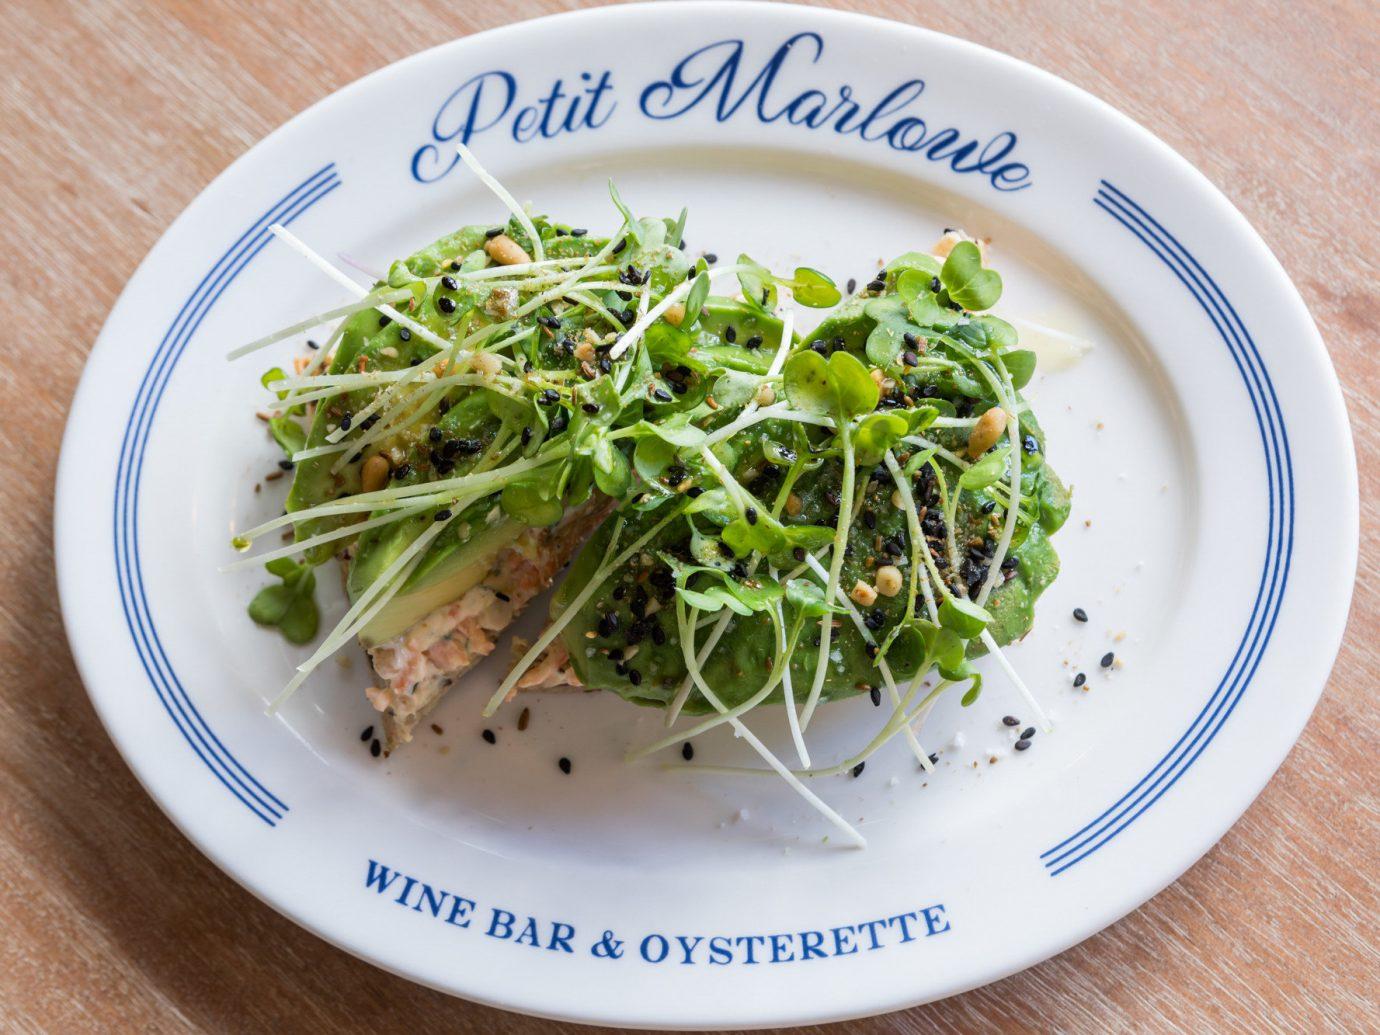 Food + Drink Travel Tips plate table food dish vegetarian food salad vegetable leaf vegetable recipe